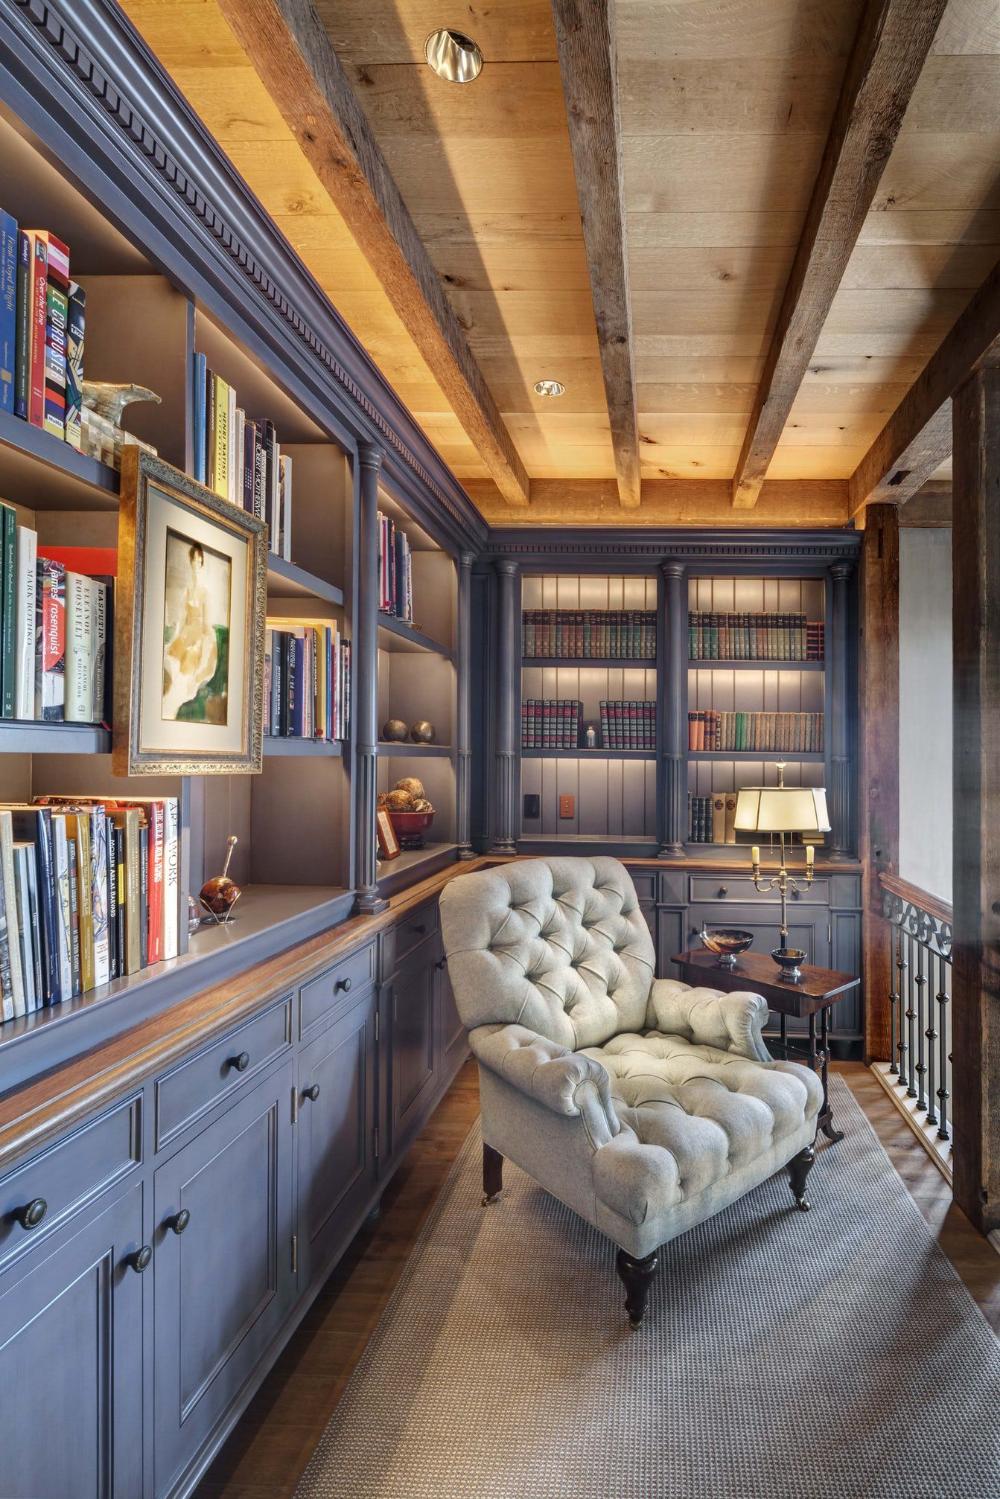 Living Room Library Design Ideas: Impressive Home Library Design Ideas